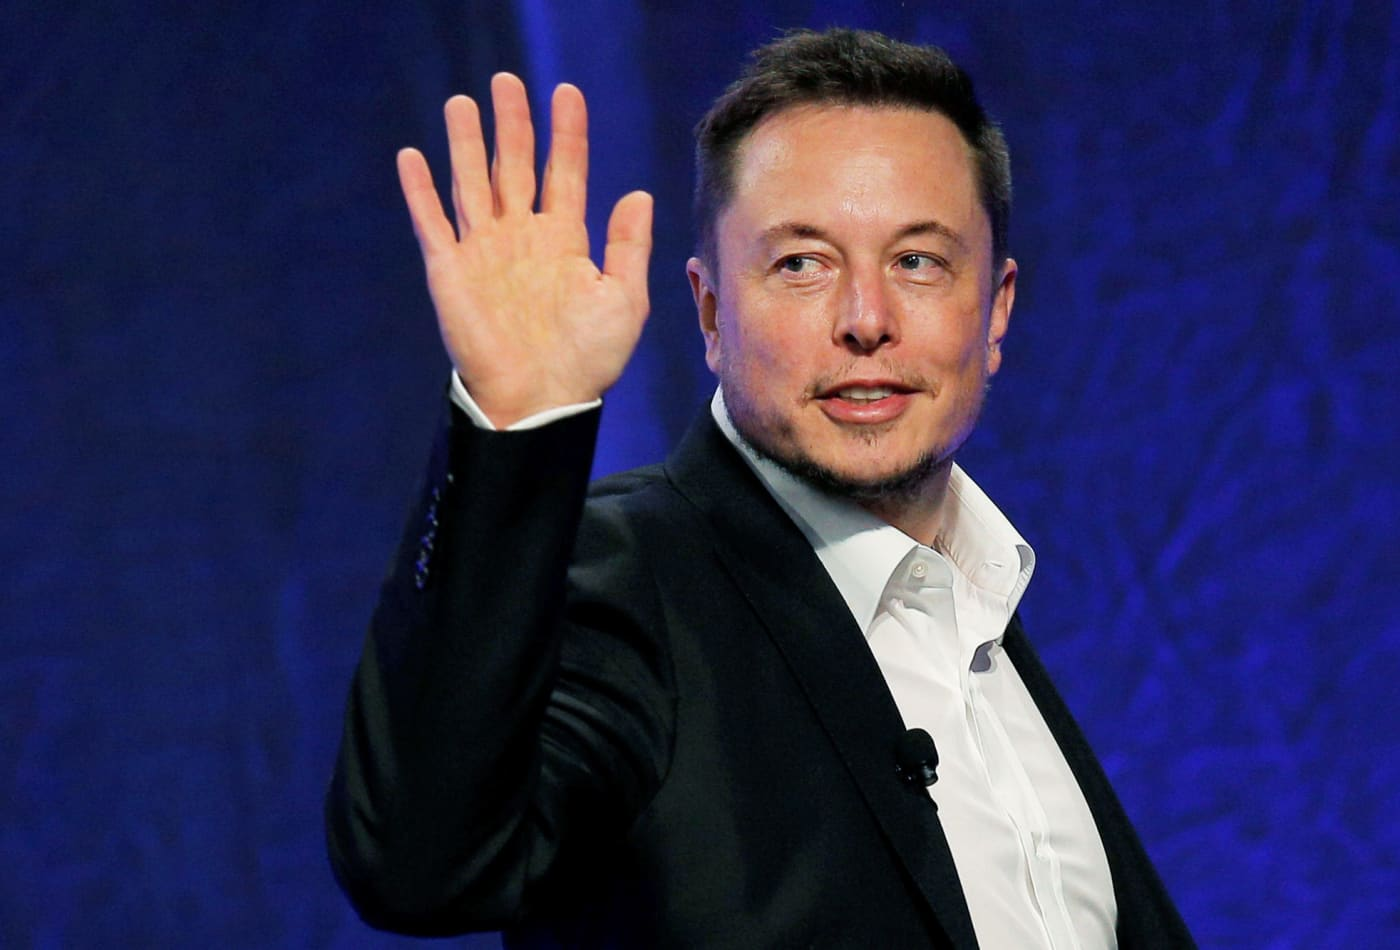 Tesla reaches $100 billion market cap, setting Elon Musk up for a huge payday